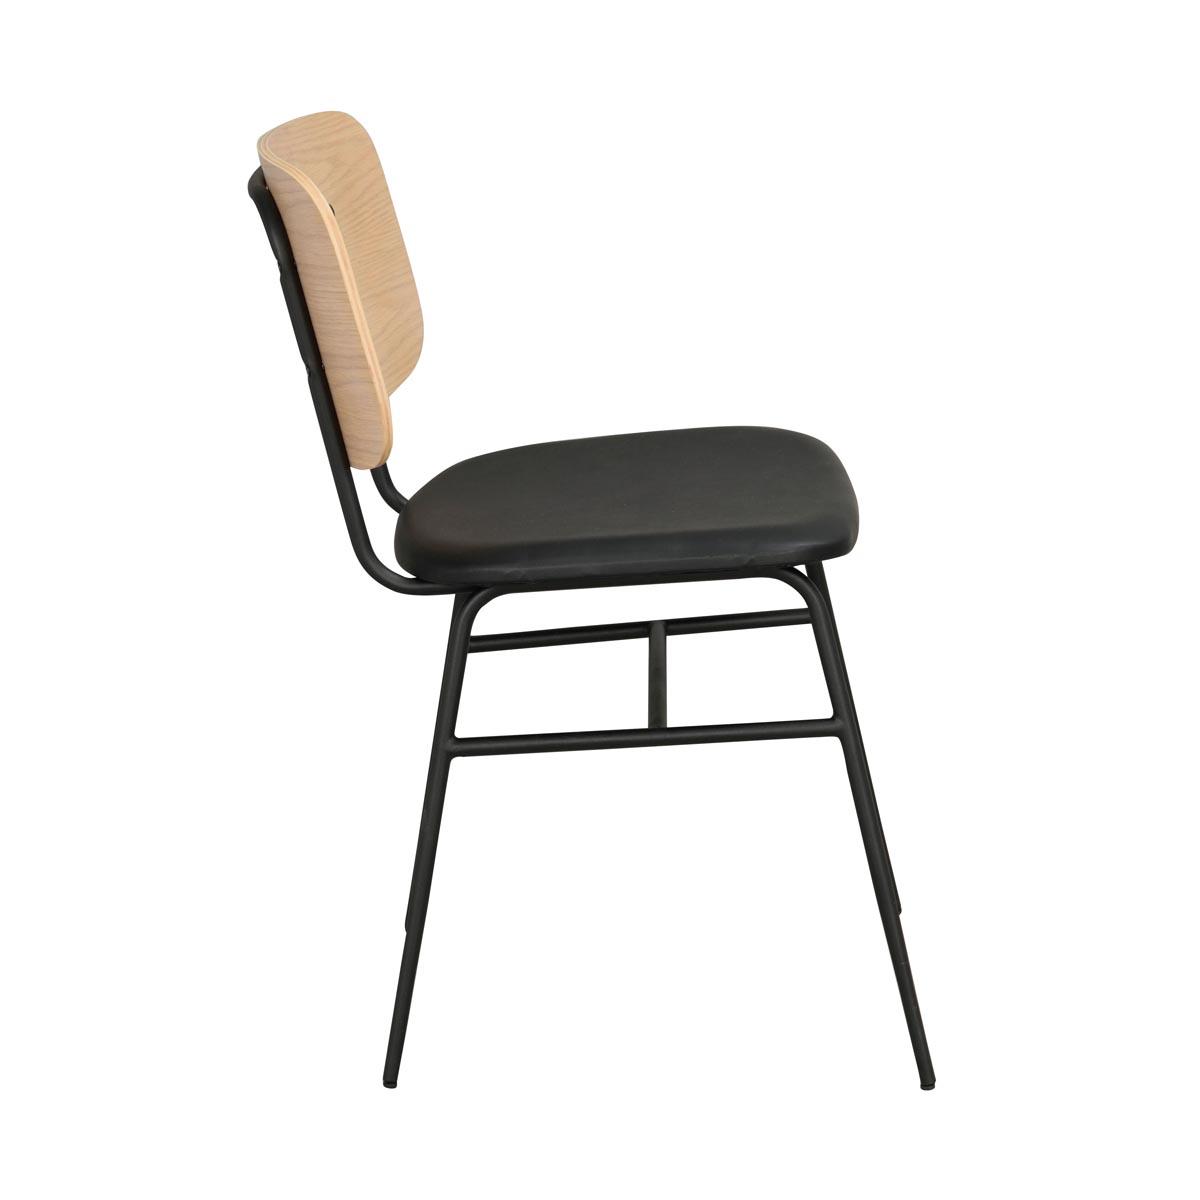 Brent-stol-vitpigm_svartR-118980_c